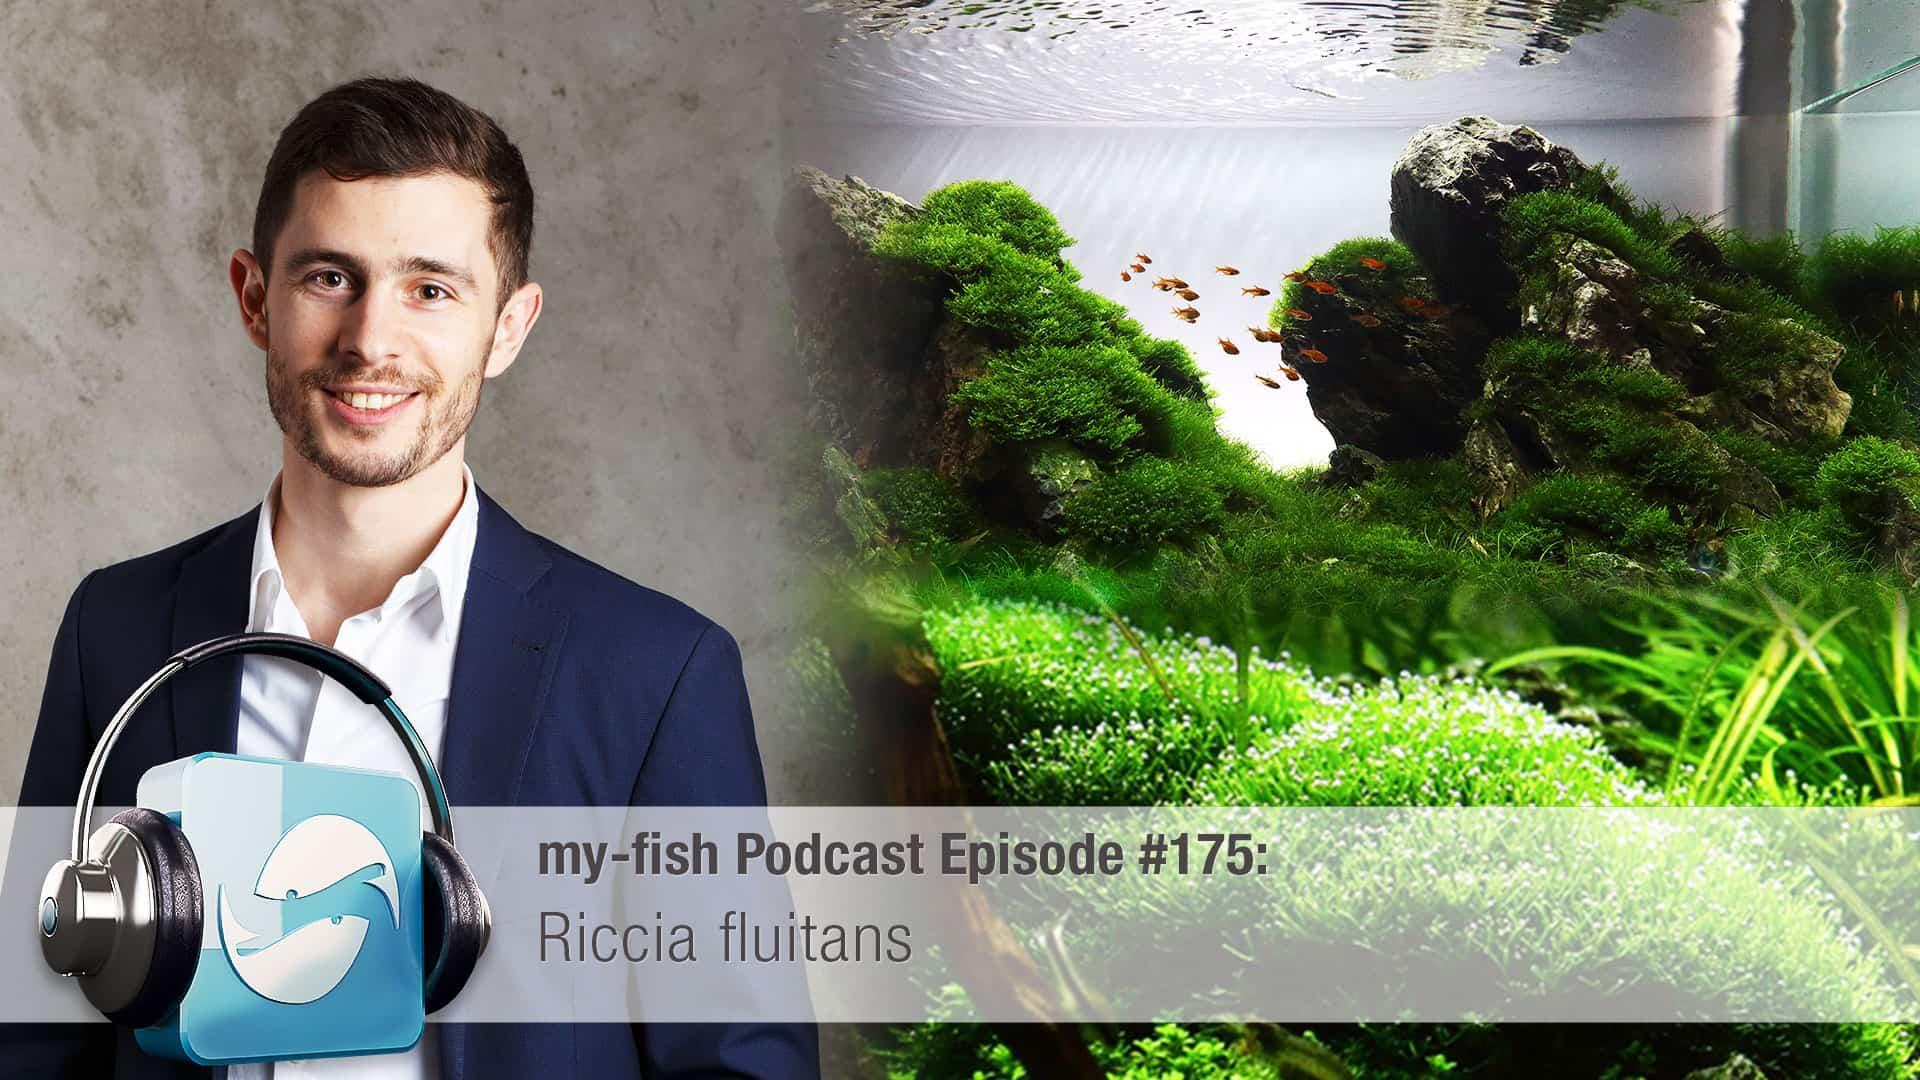 175 Riccia fluitans - Das schwimmende Teichlebermoos 1